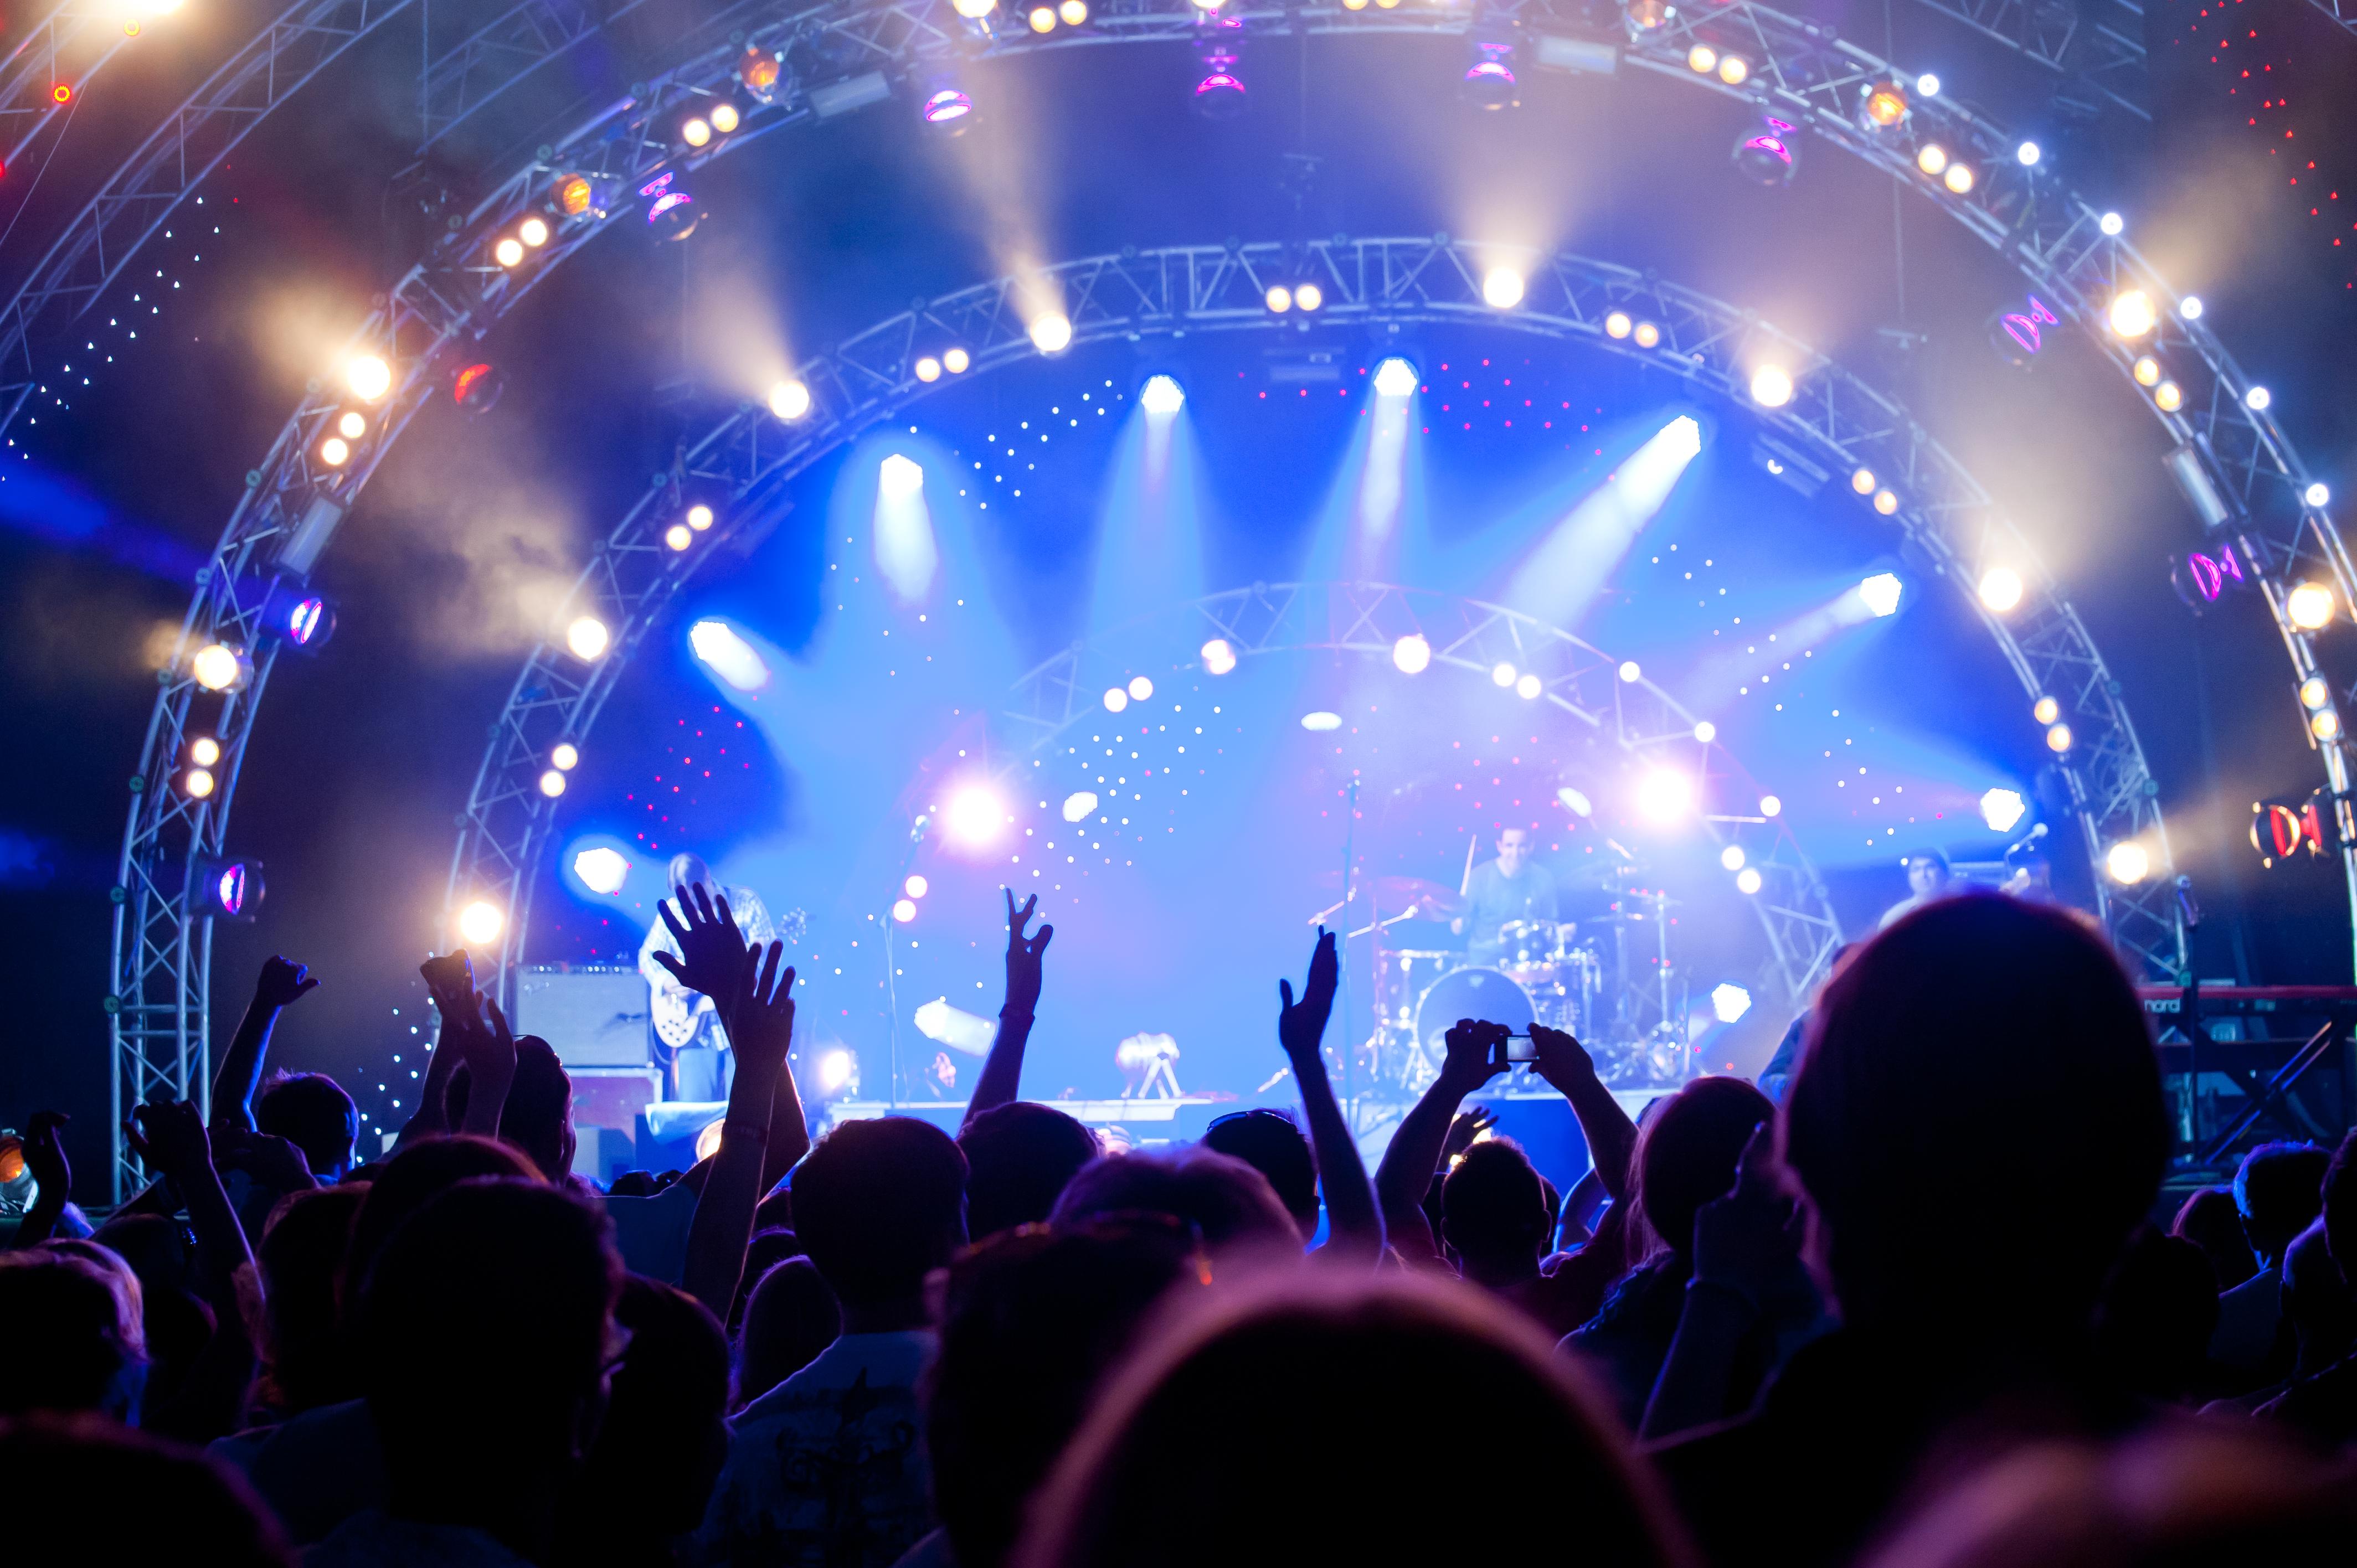 concerte oferte oferta concert site bilet ovi travel